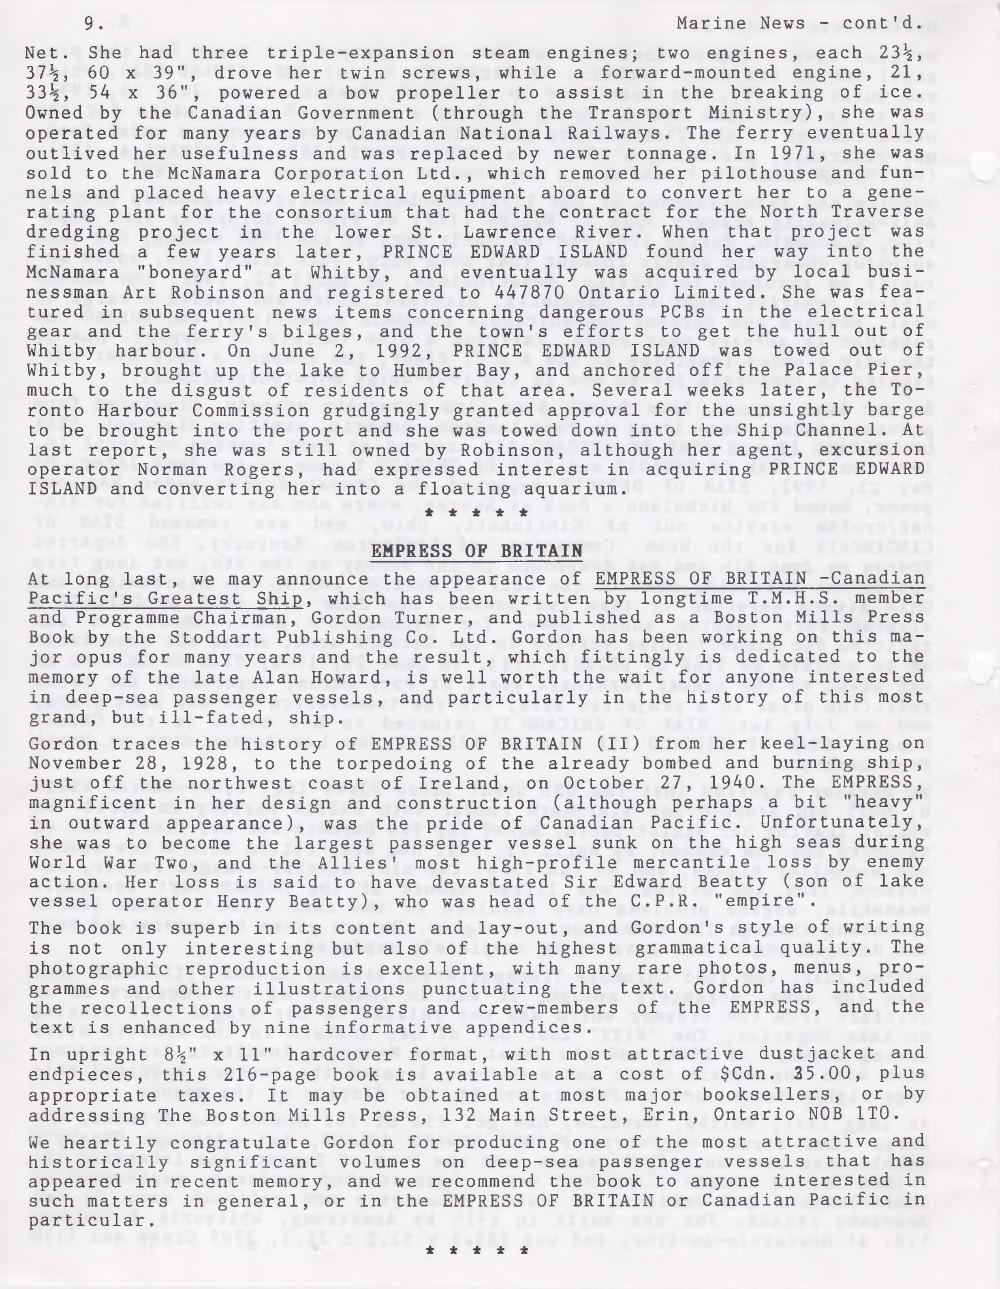 Scanner, v. 24, no. 9 (Mid-Summer 1992)